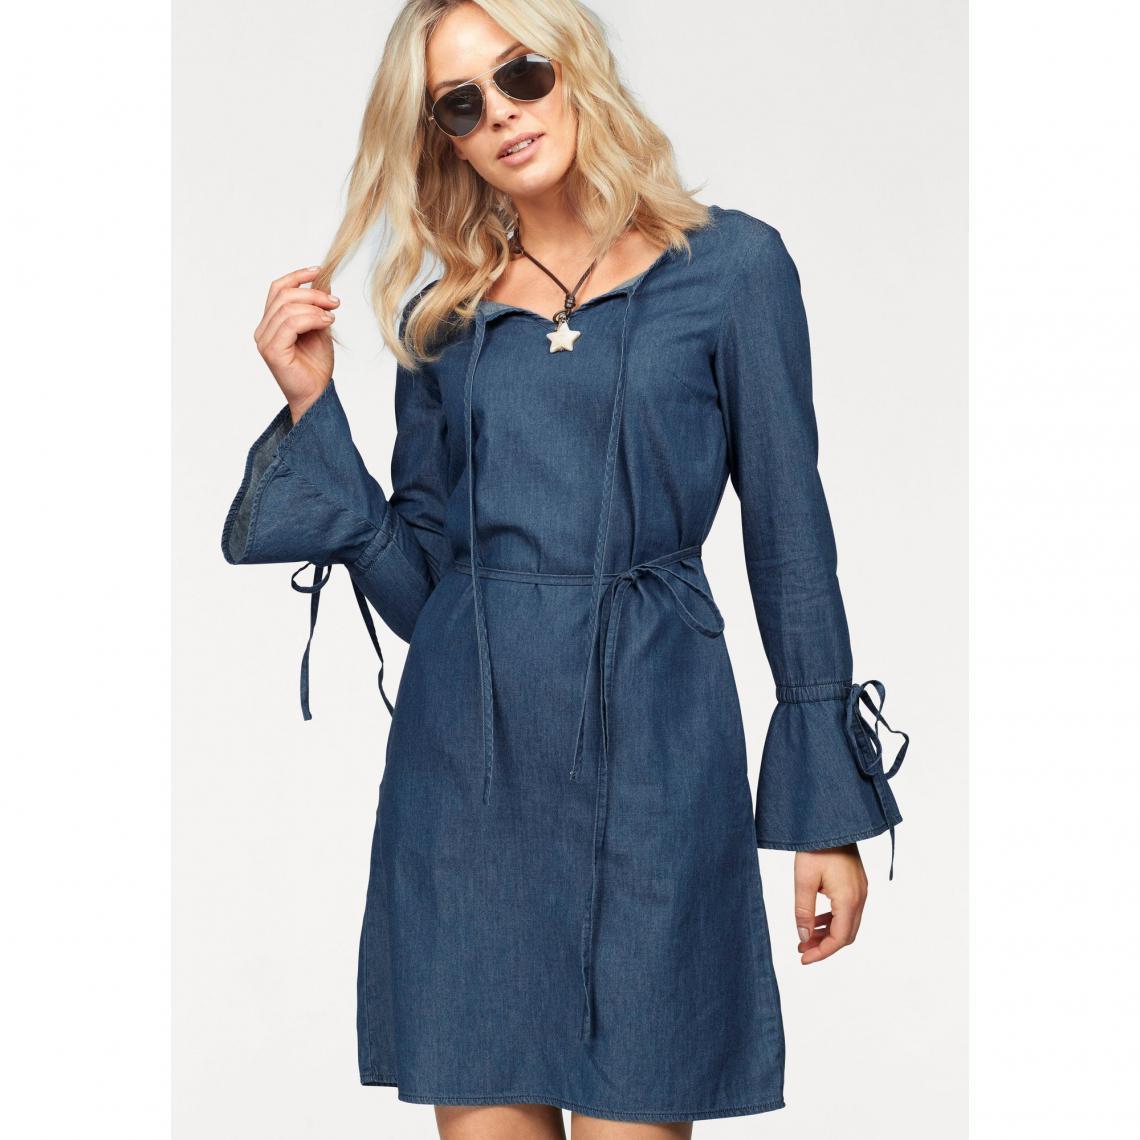 accb883461944 Robe manches longues en denim femme Arizona - bleu foncé Arizona Femme